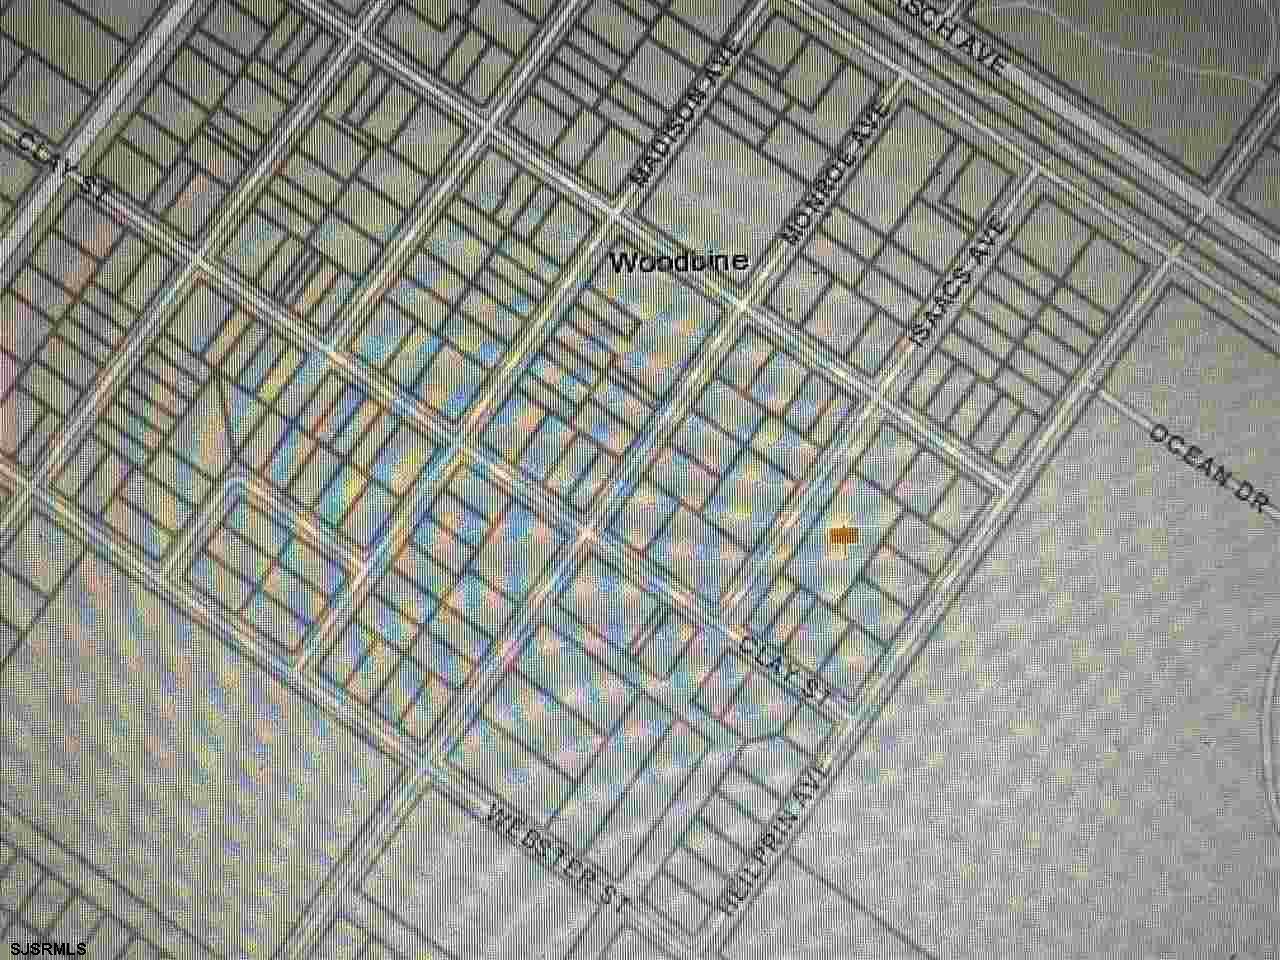 617 Isaacs Ave, Woodbine Borough NJ 08270 - Photo 2